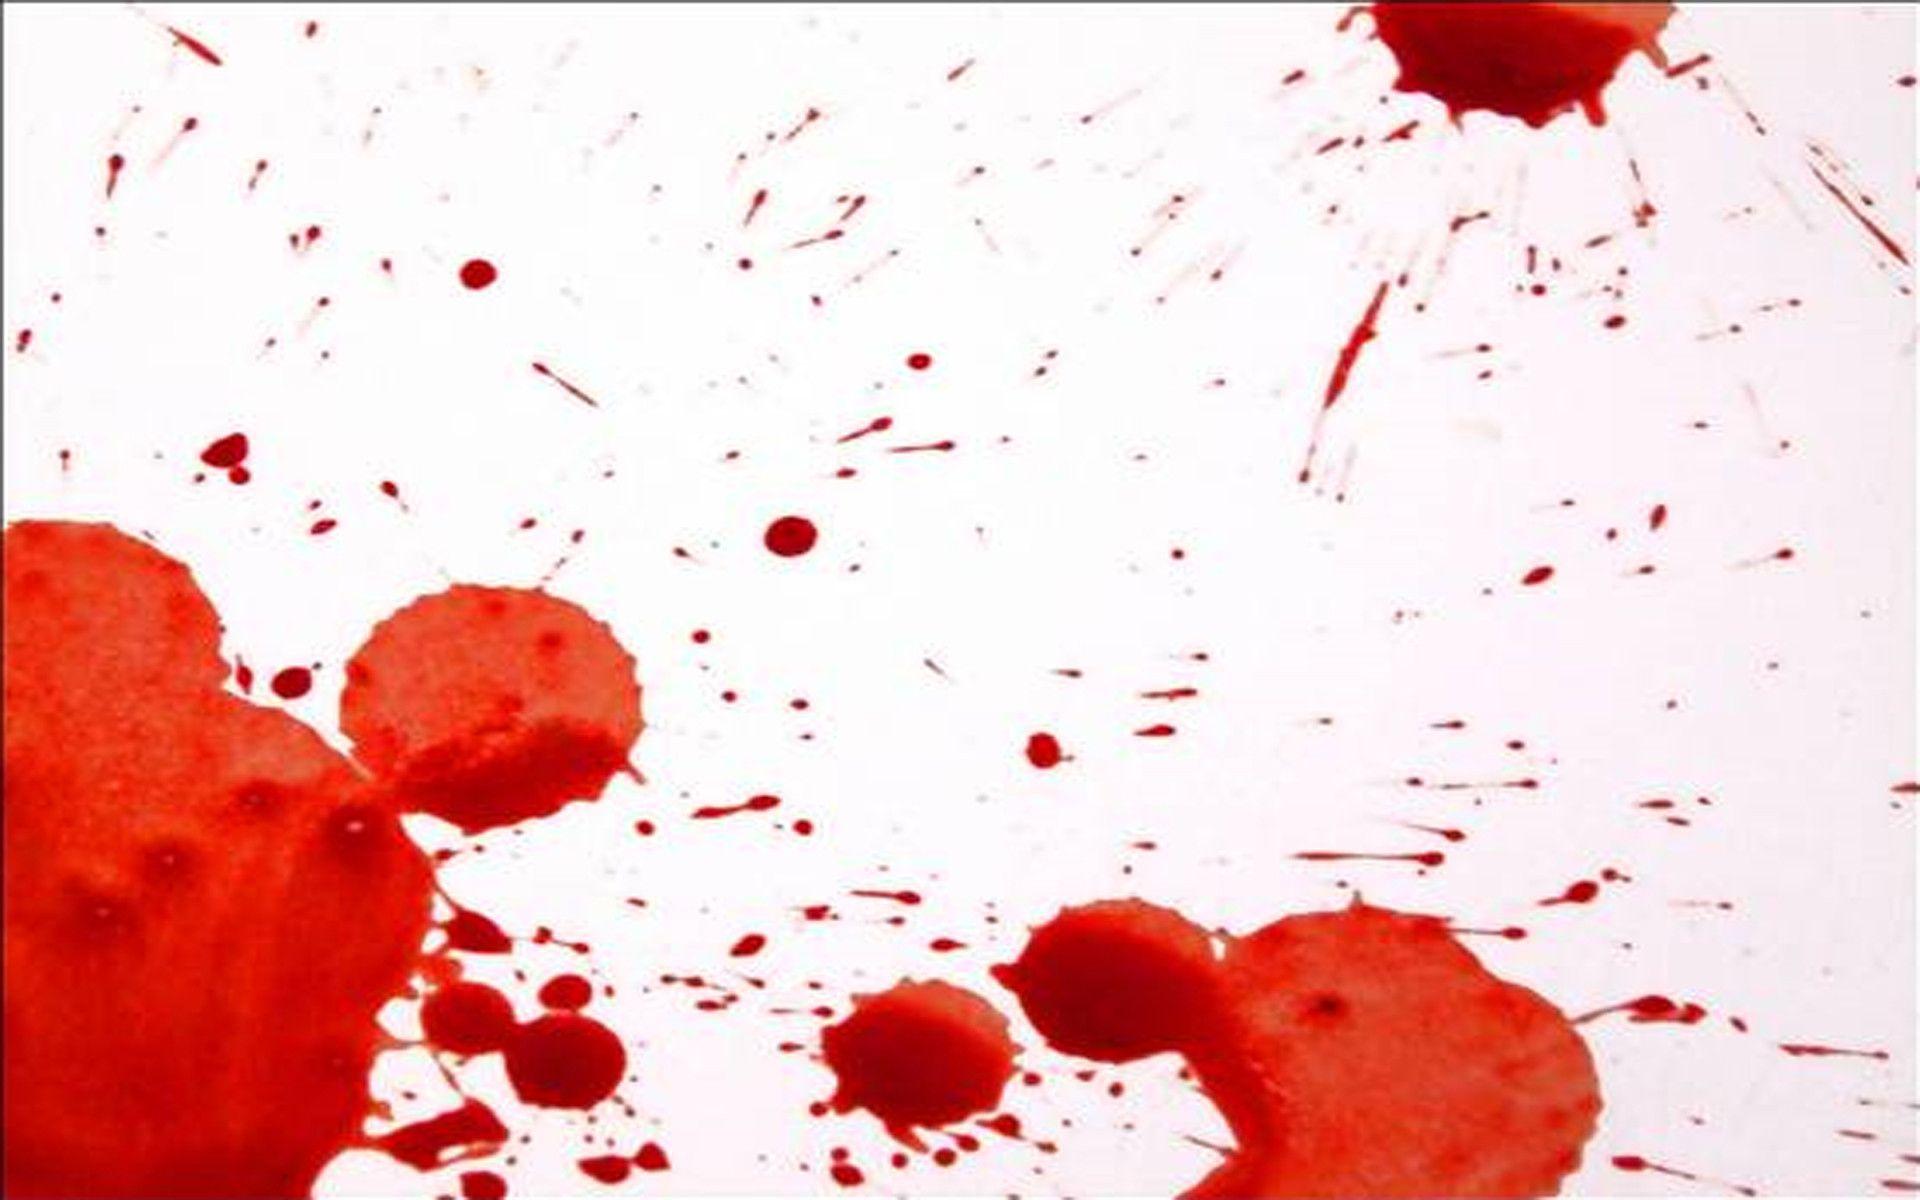 Wallpaper a blood wallpapers - Search Results For Blood Splatter Wallpaper Hd Dexter Adorable Wallpapers